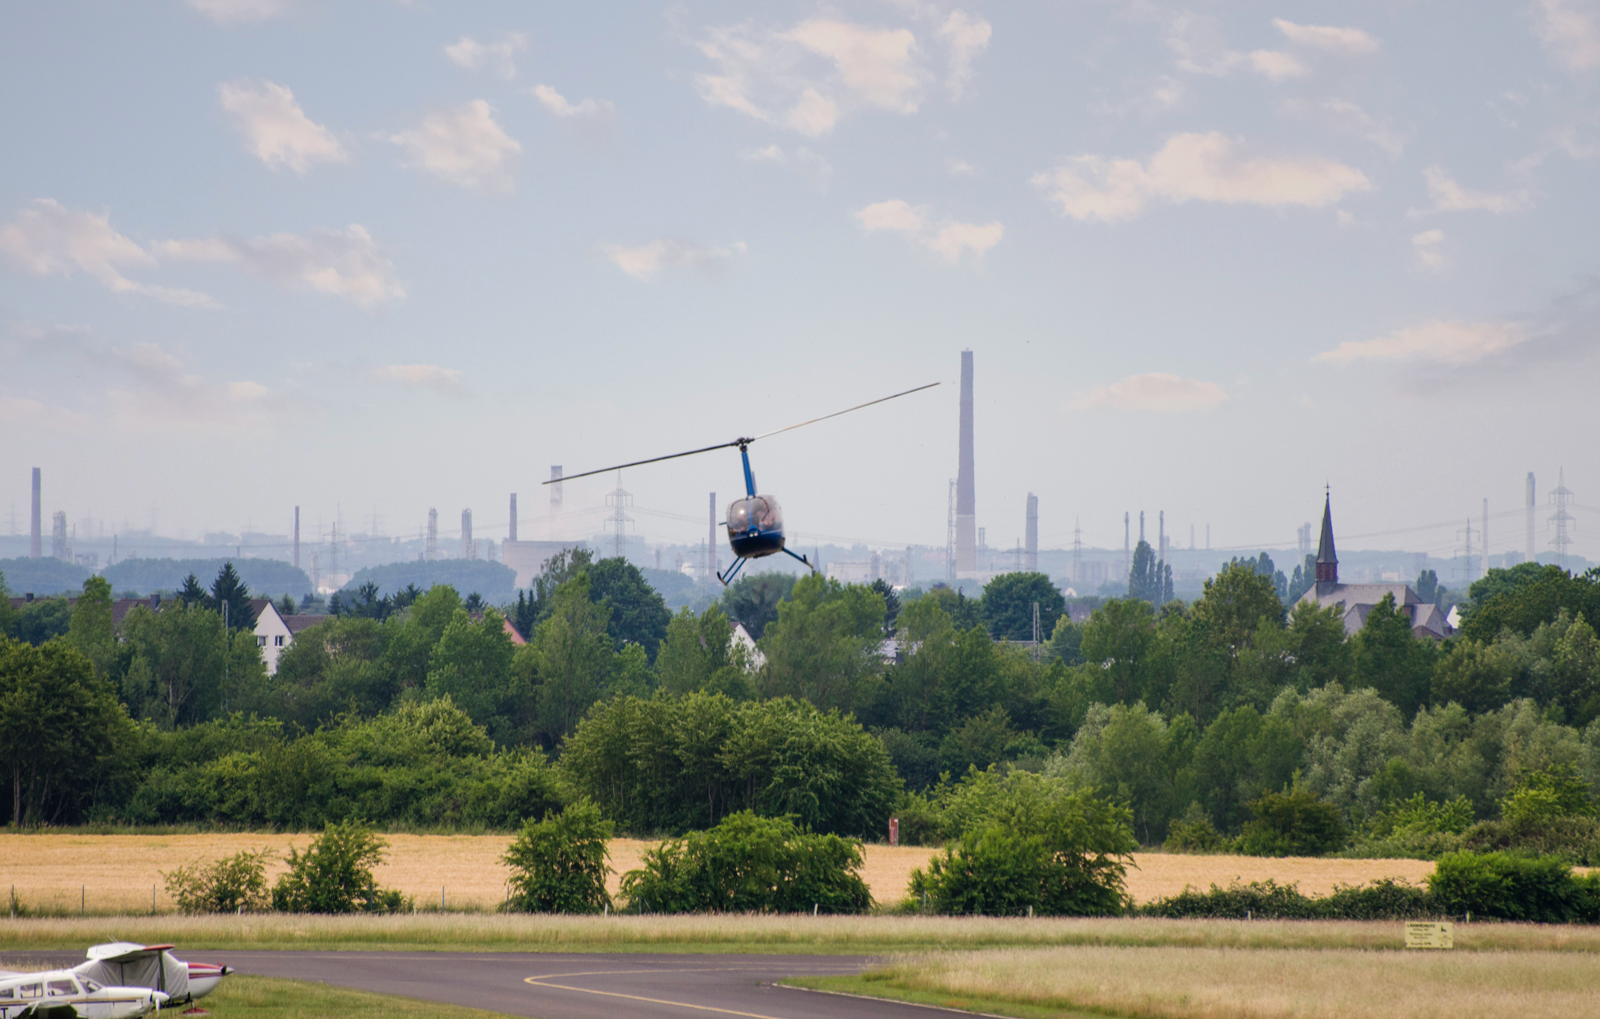 romantik-hubschrauber-rundflug-chemnitz-bg4